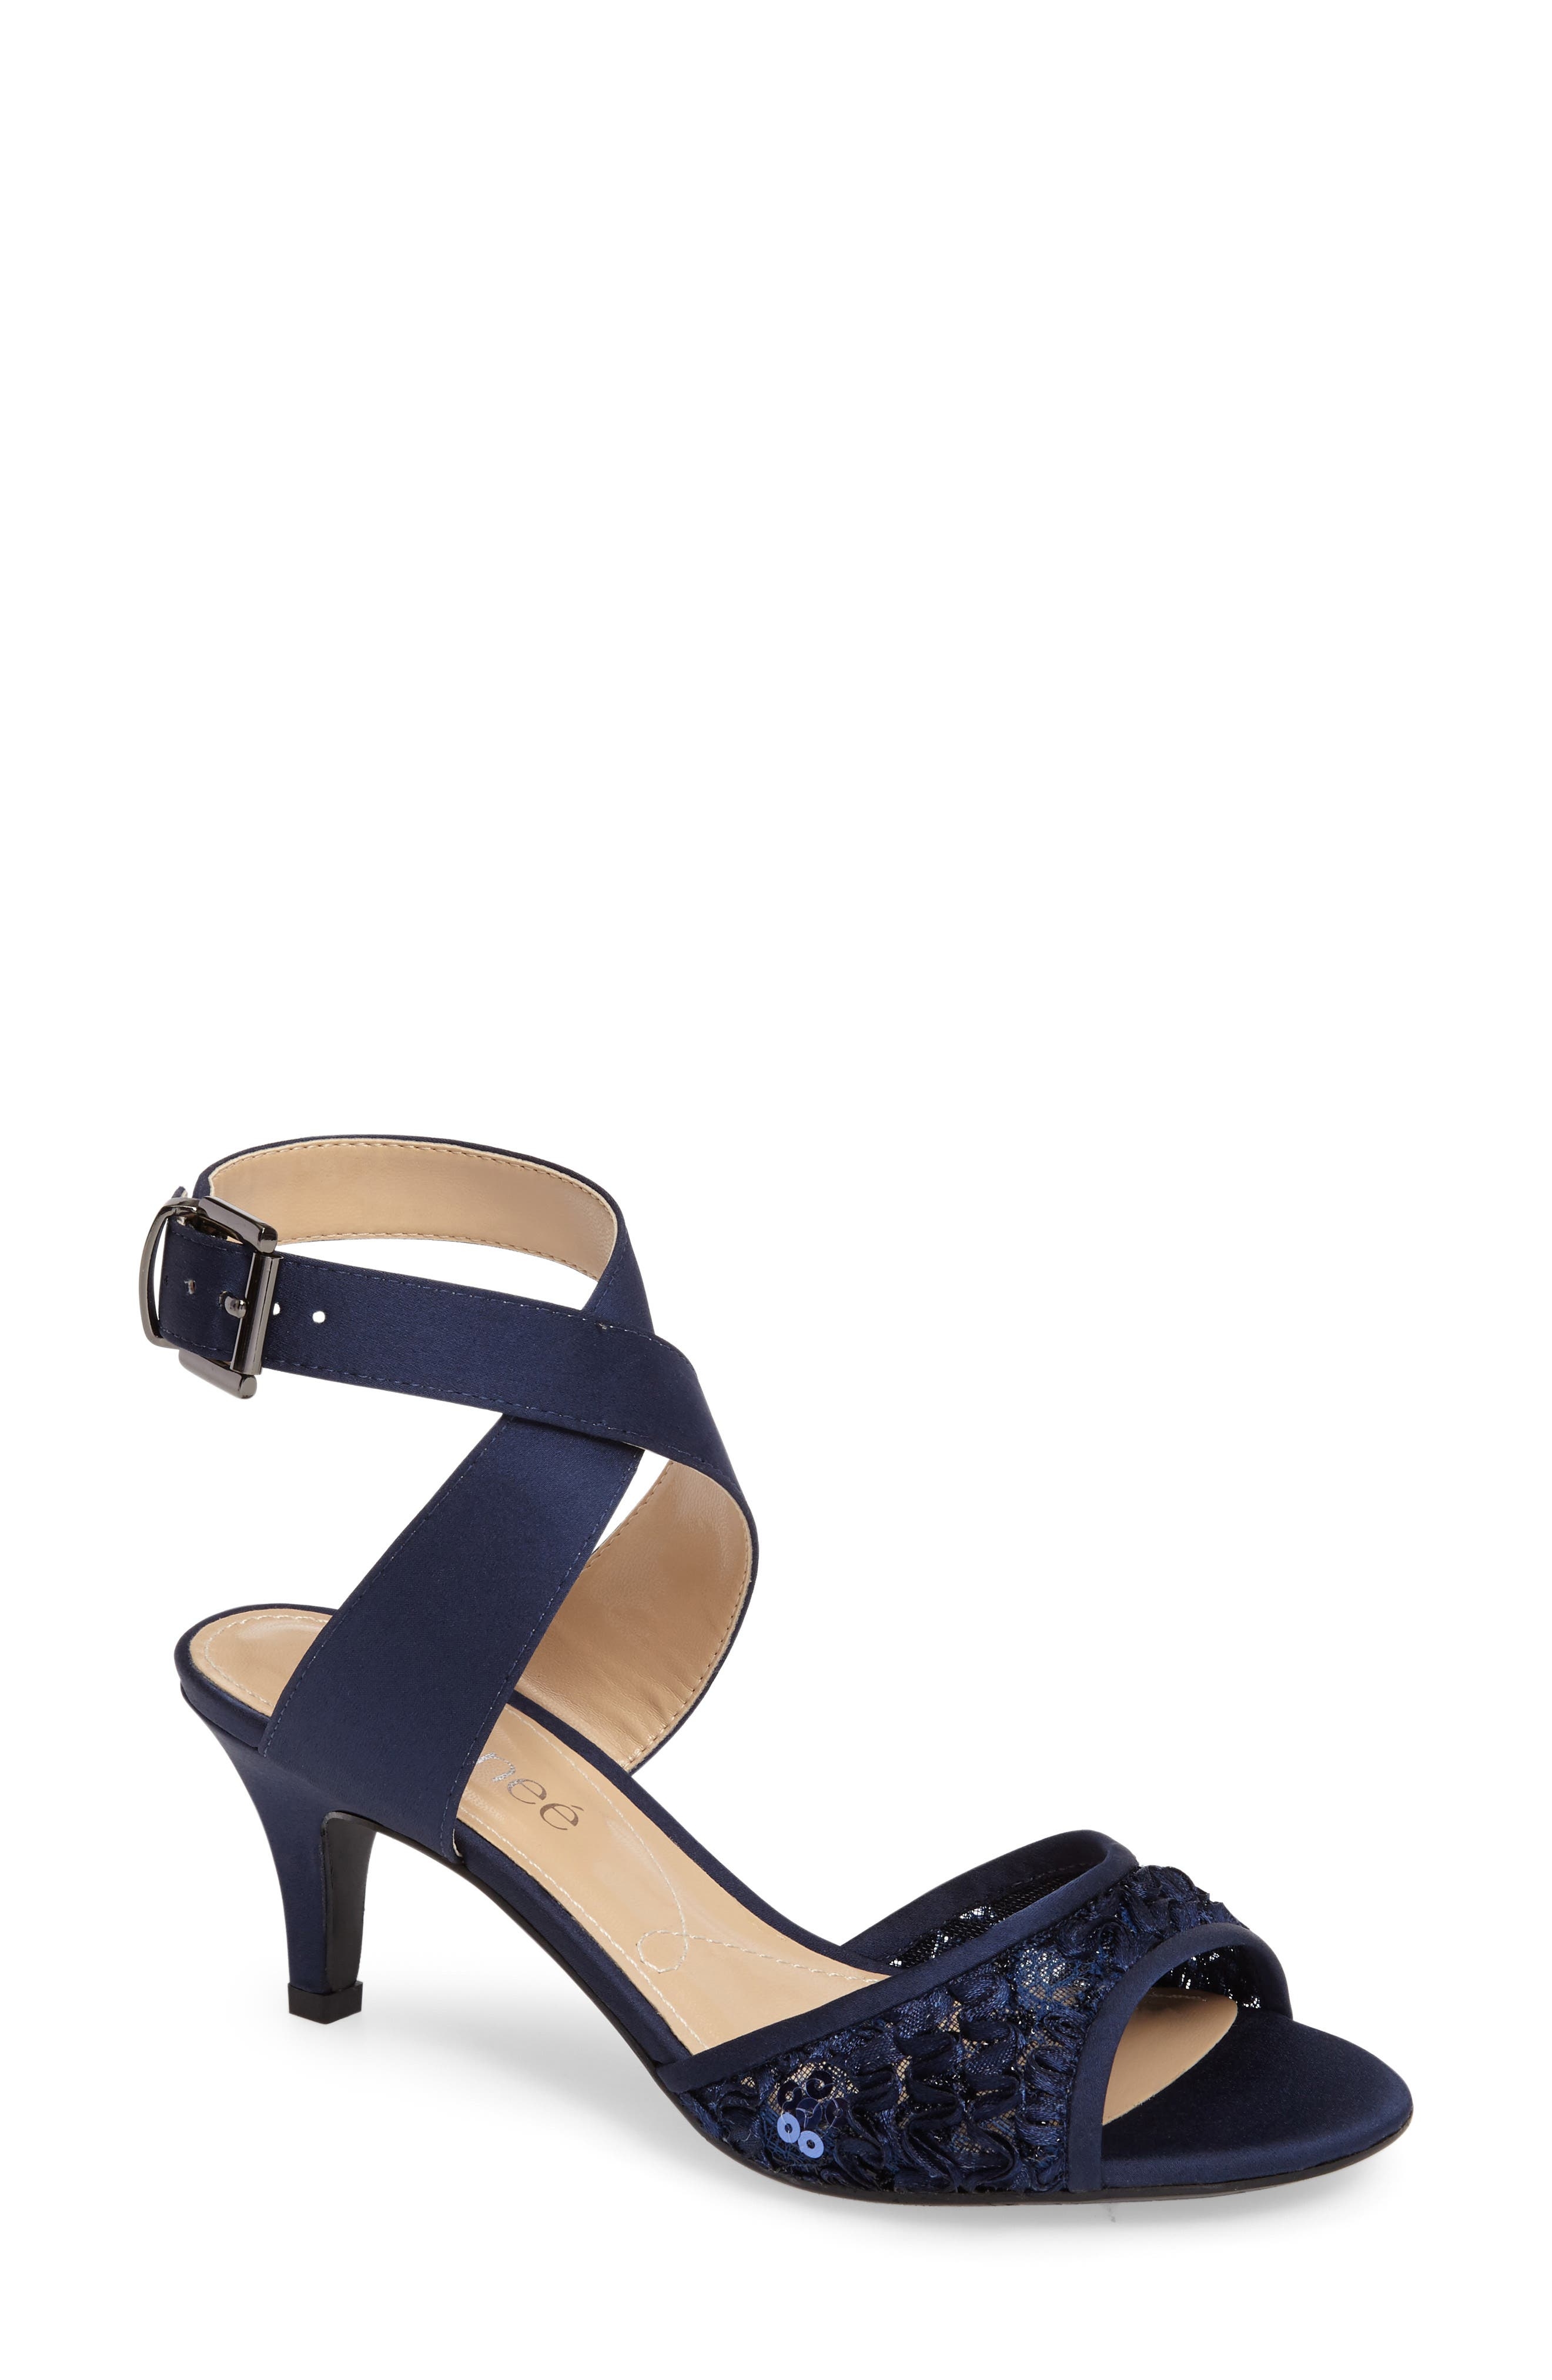 'Soncino' Ankle Strap Sandal